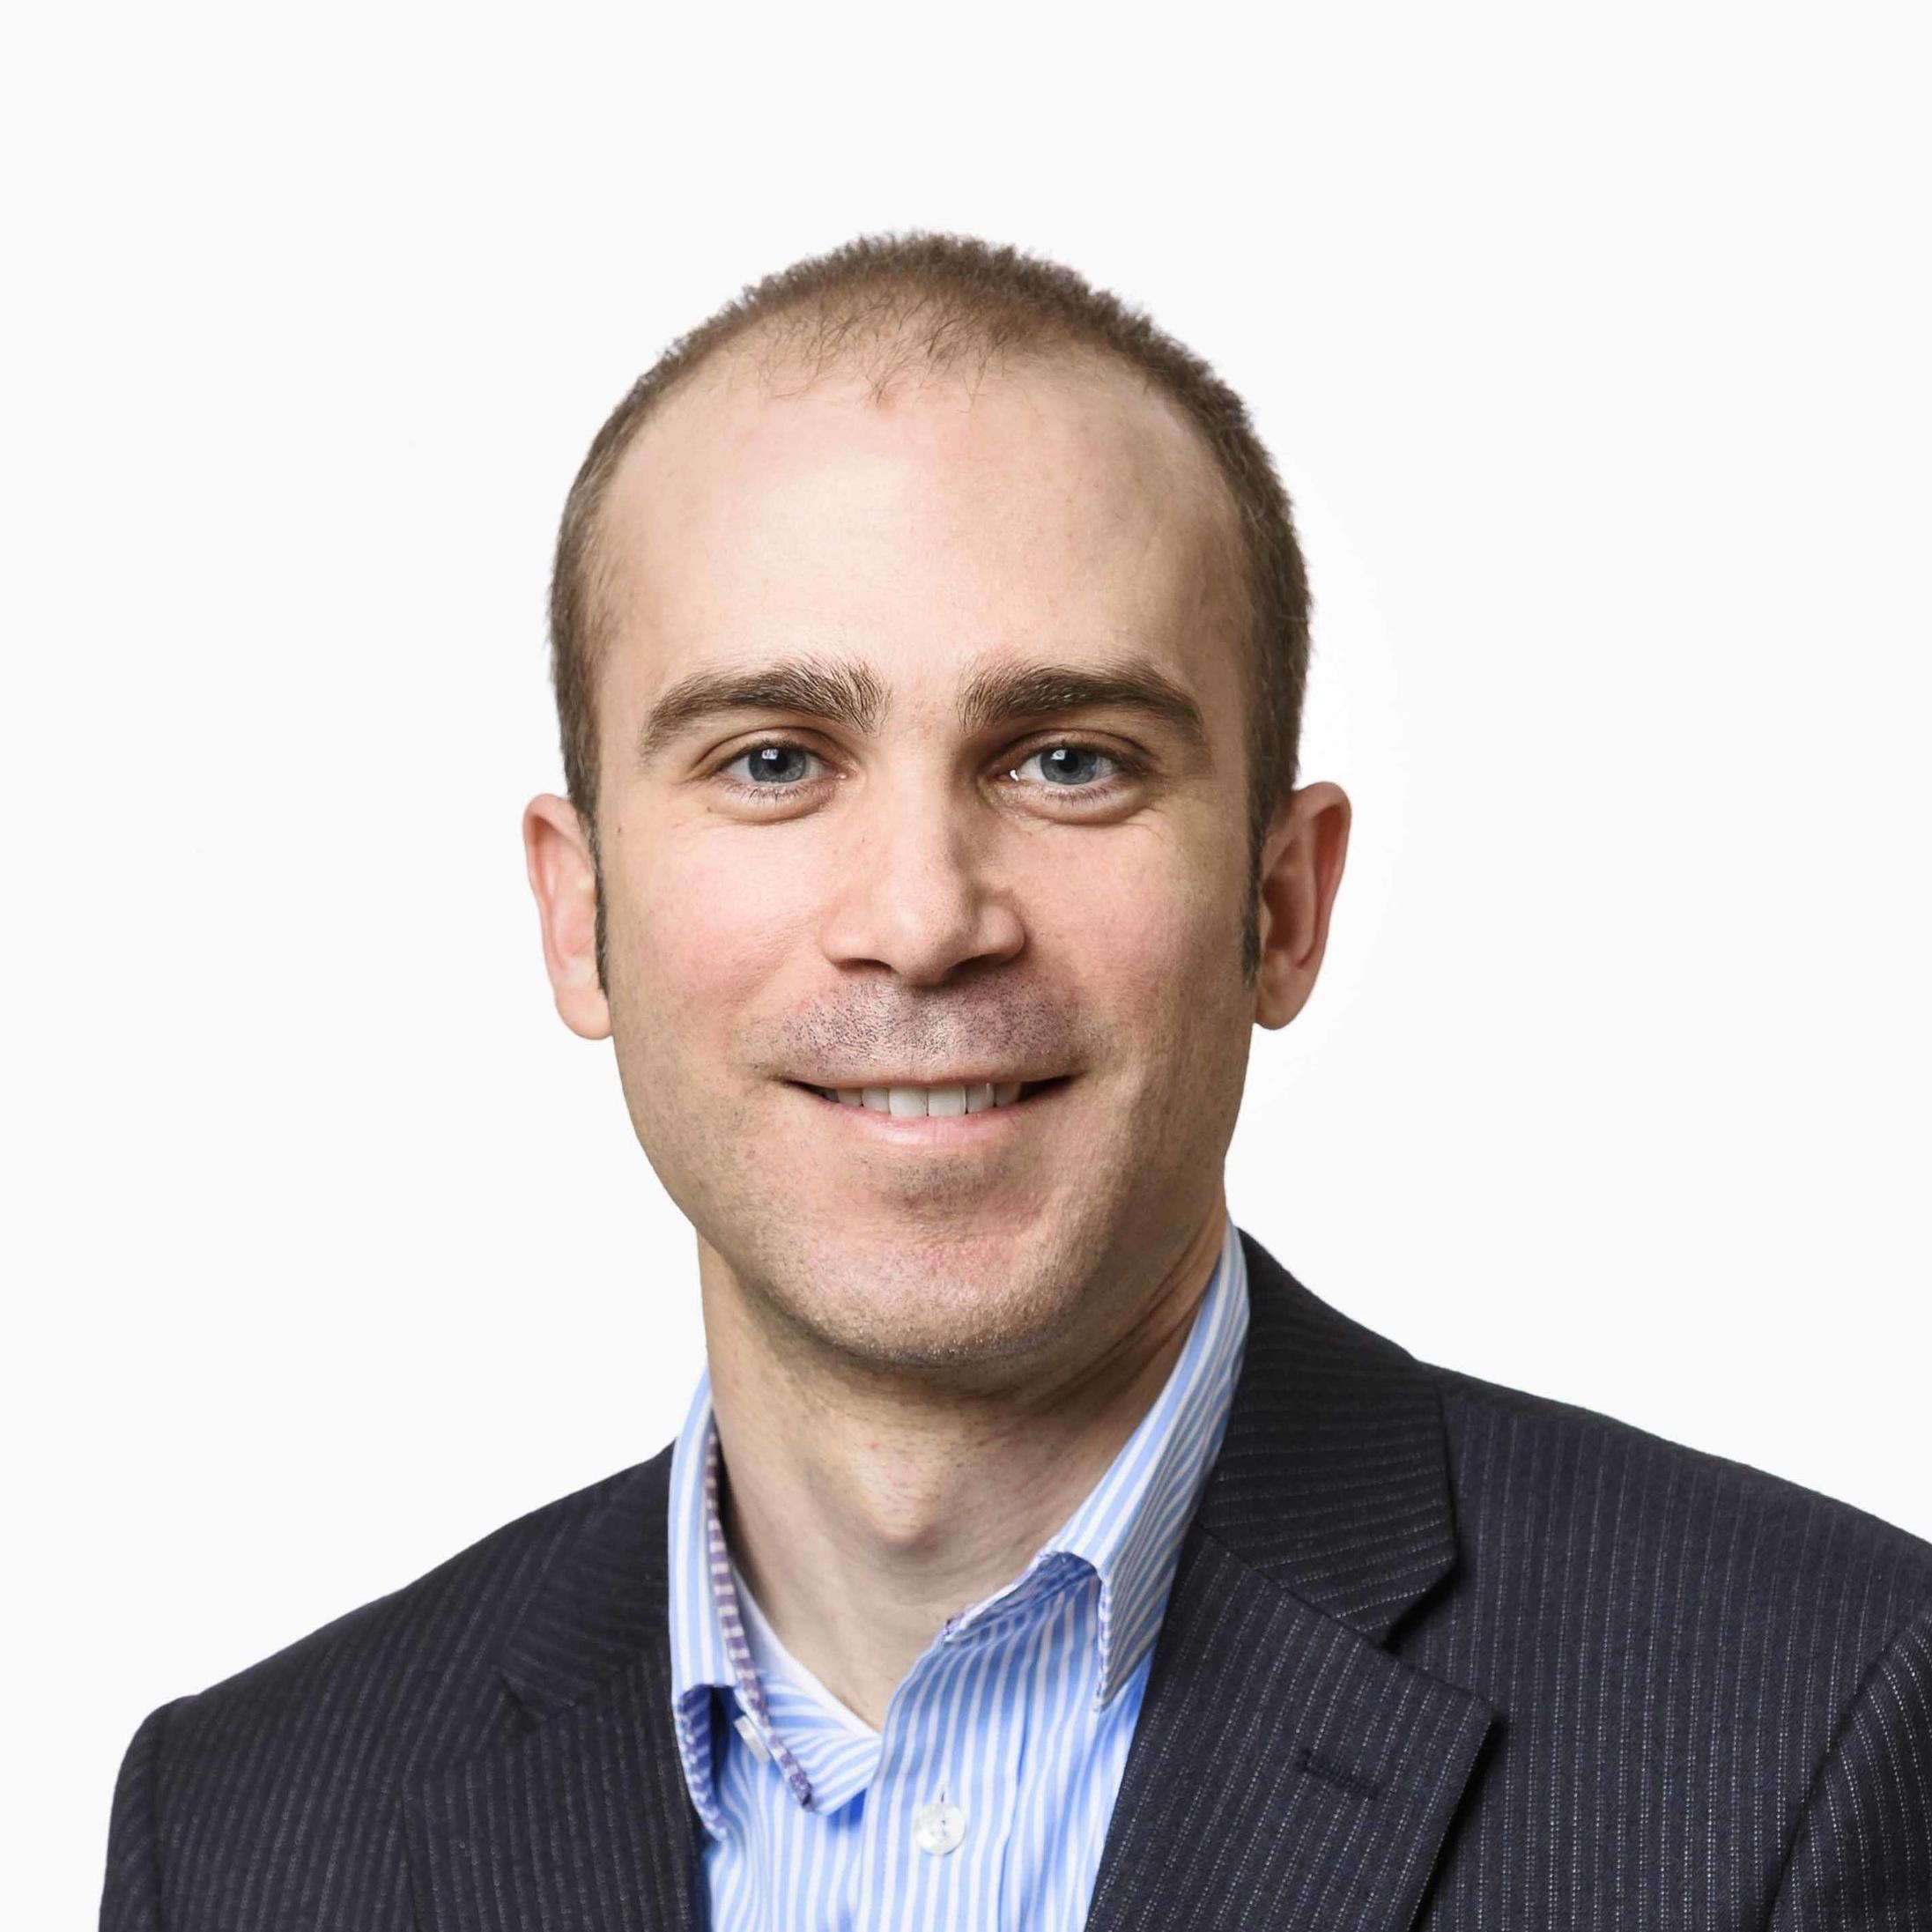 Dr. Robert Klose - Chair & Professor of GeneticsUniversity of Oxford